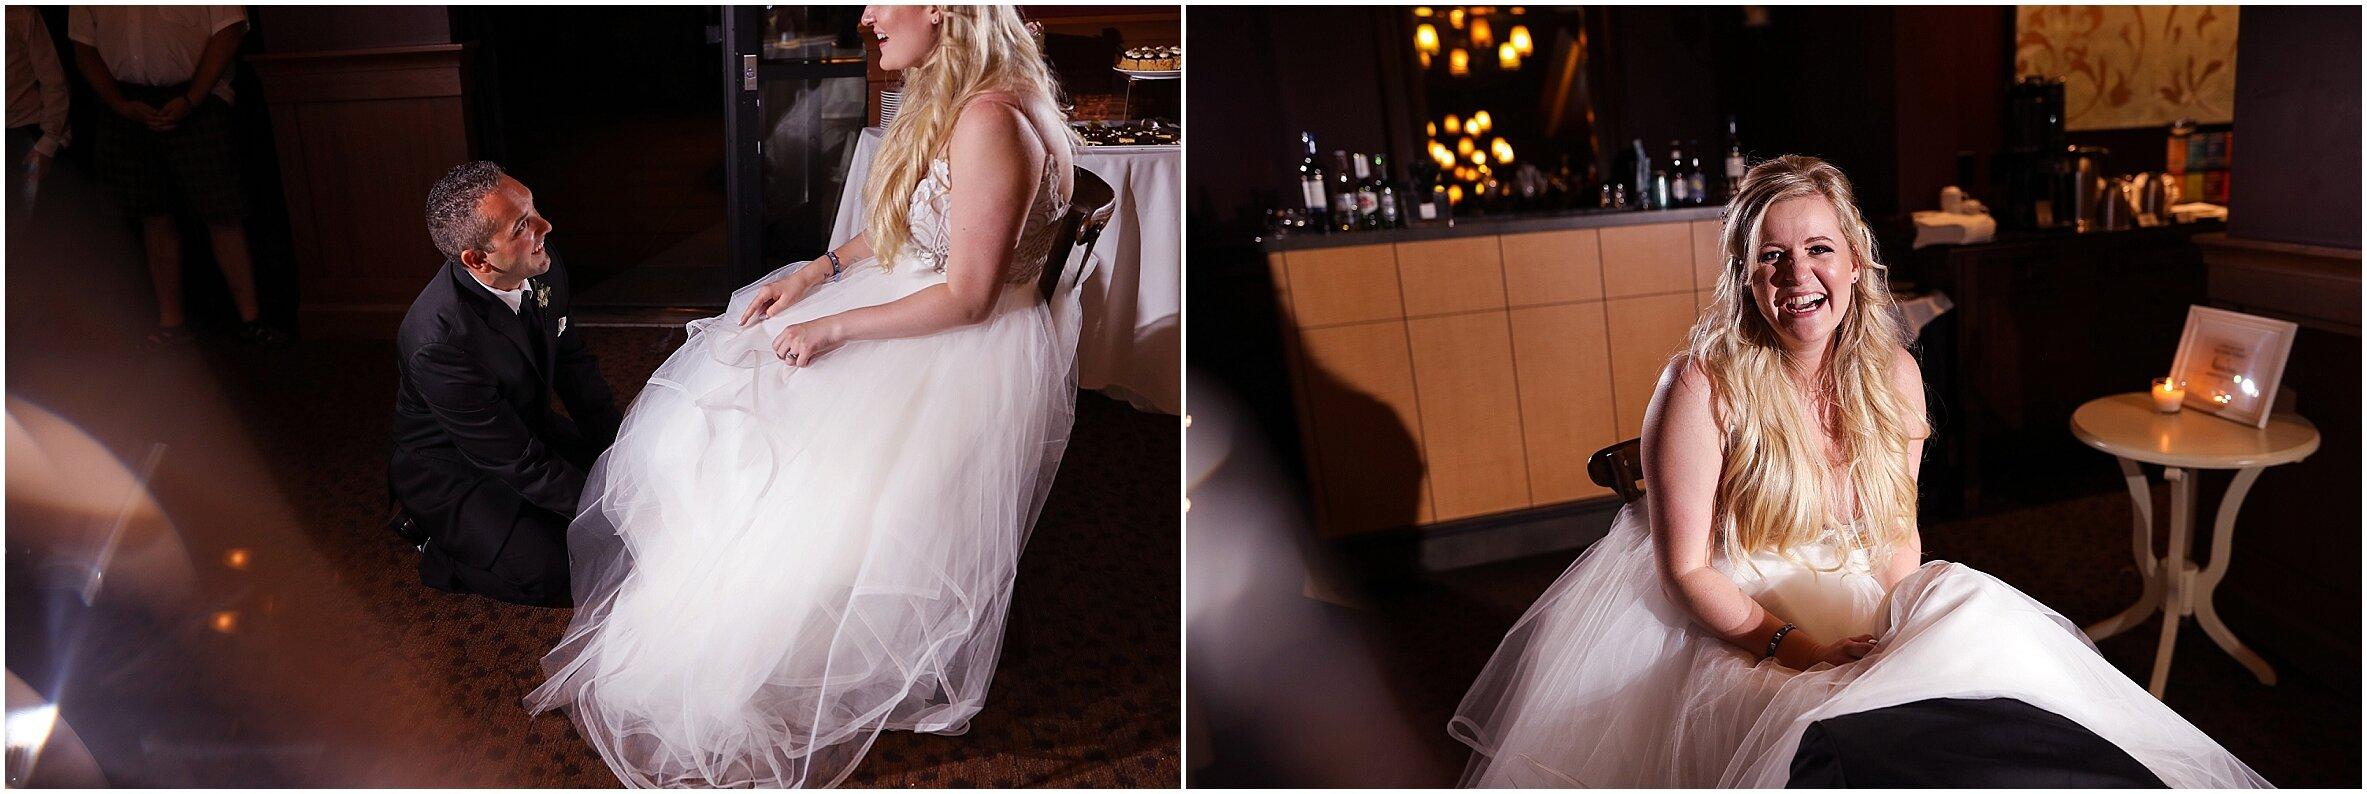 calgary-same-sex-wedding-bowness-calgary_0268.jpg